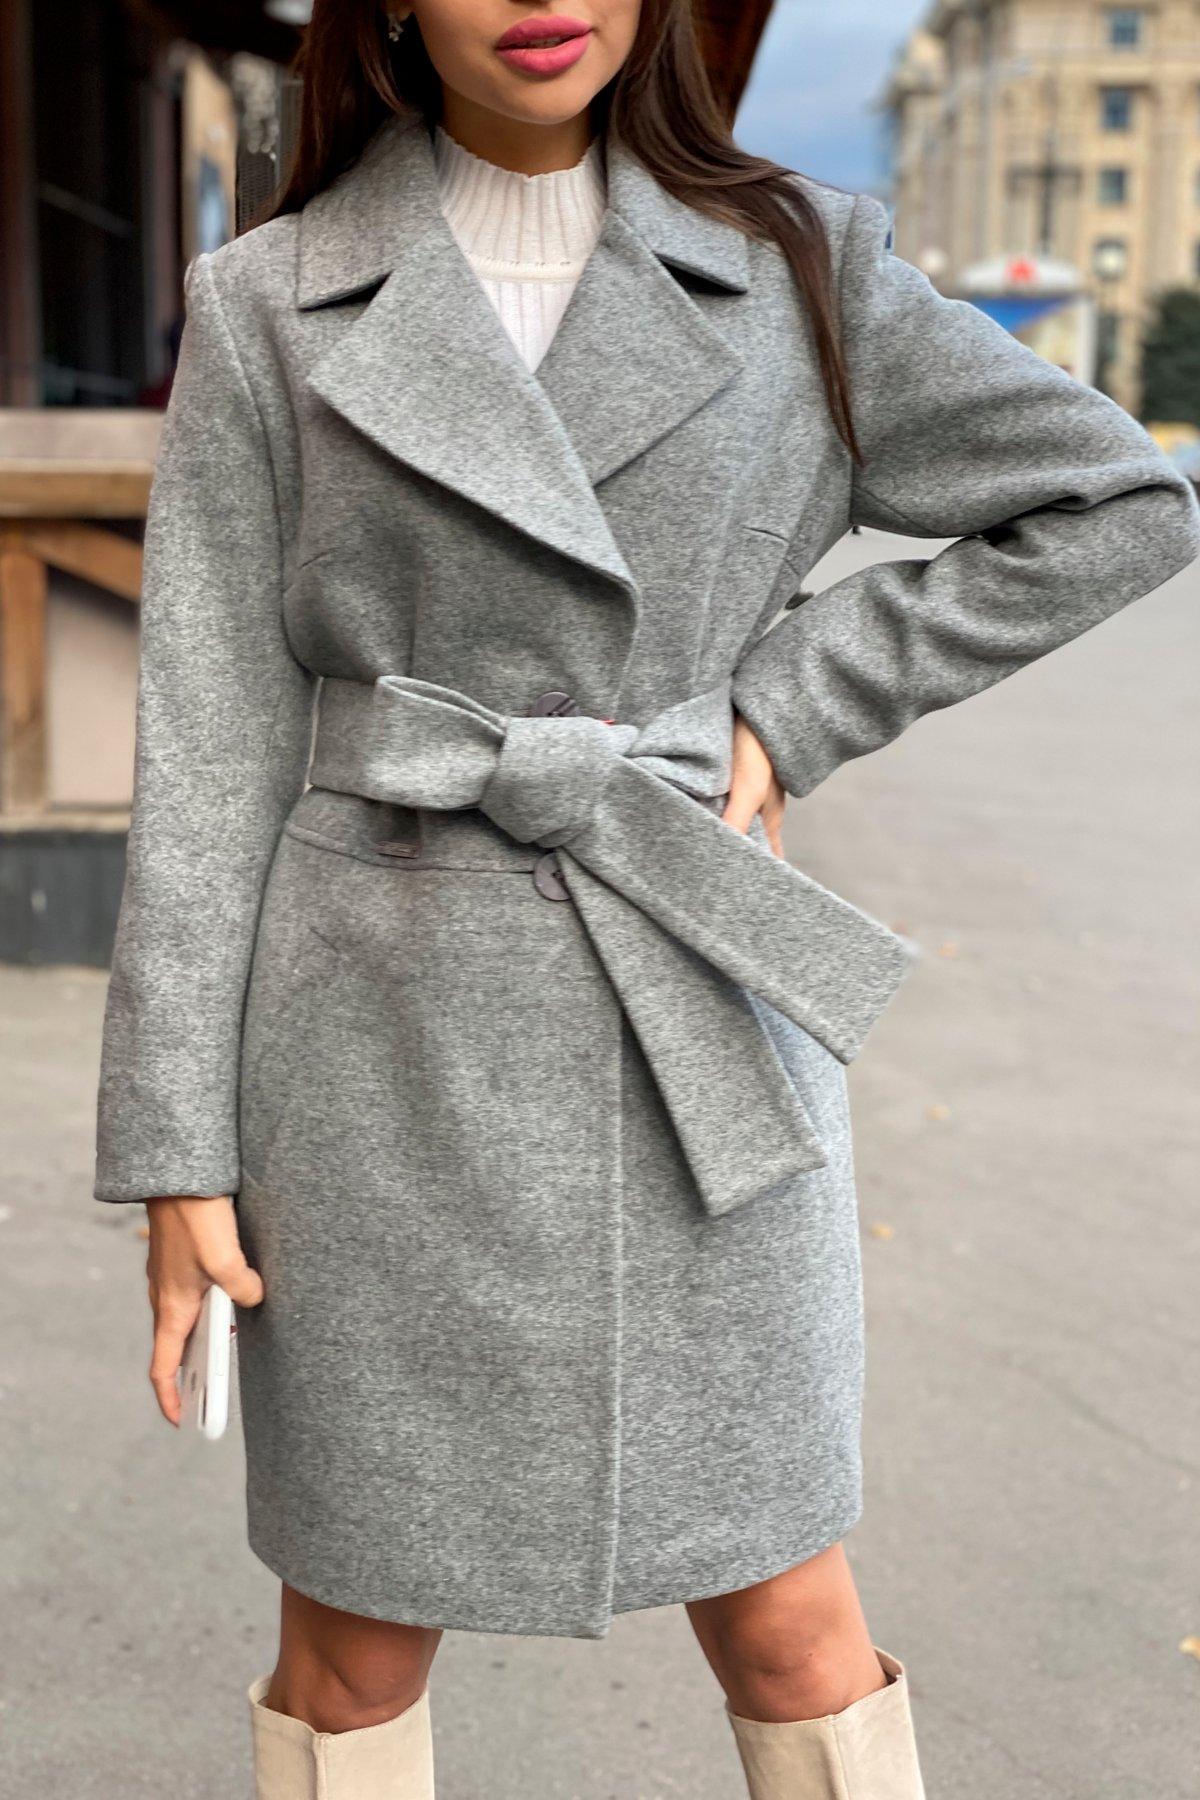 Пальто Габриэлла 7823 АРТ. 43703 Цвет: Серый 1 - фото 10, интернет магазин tm-modus.ru